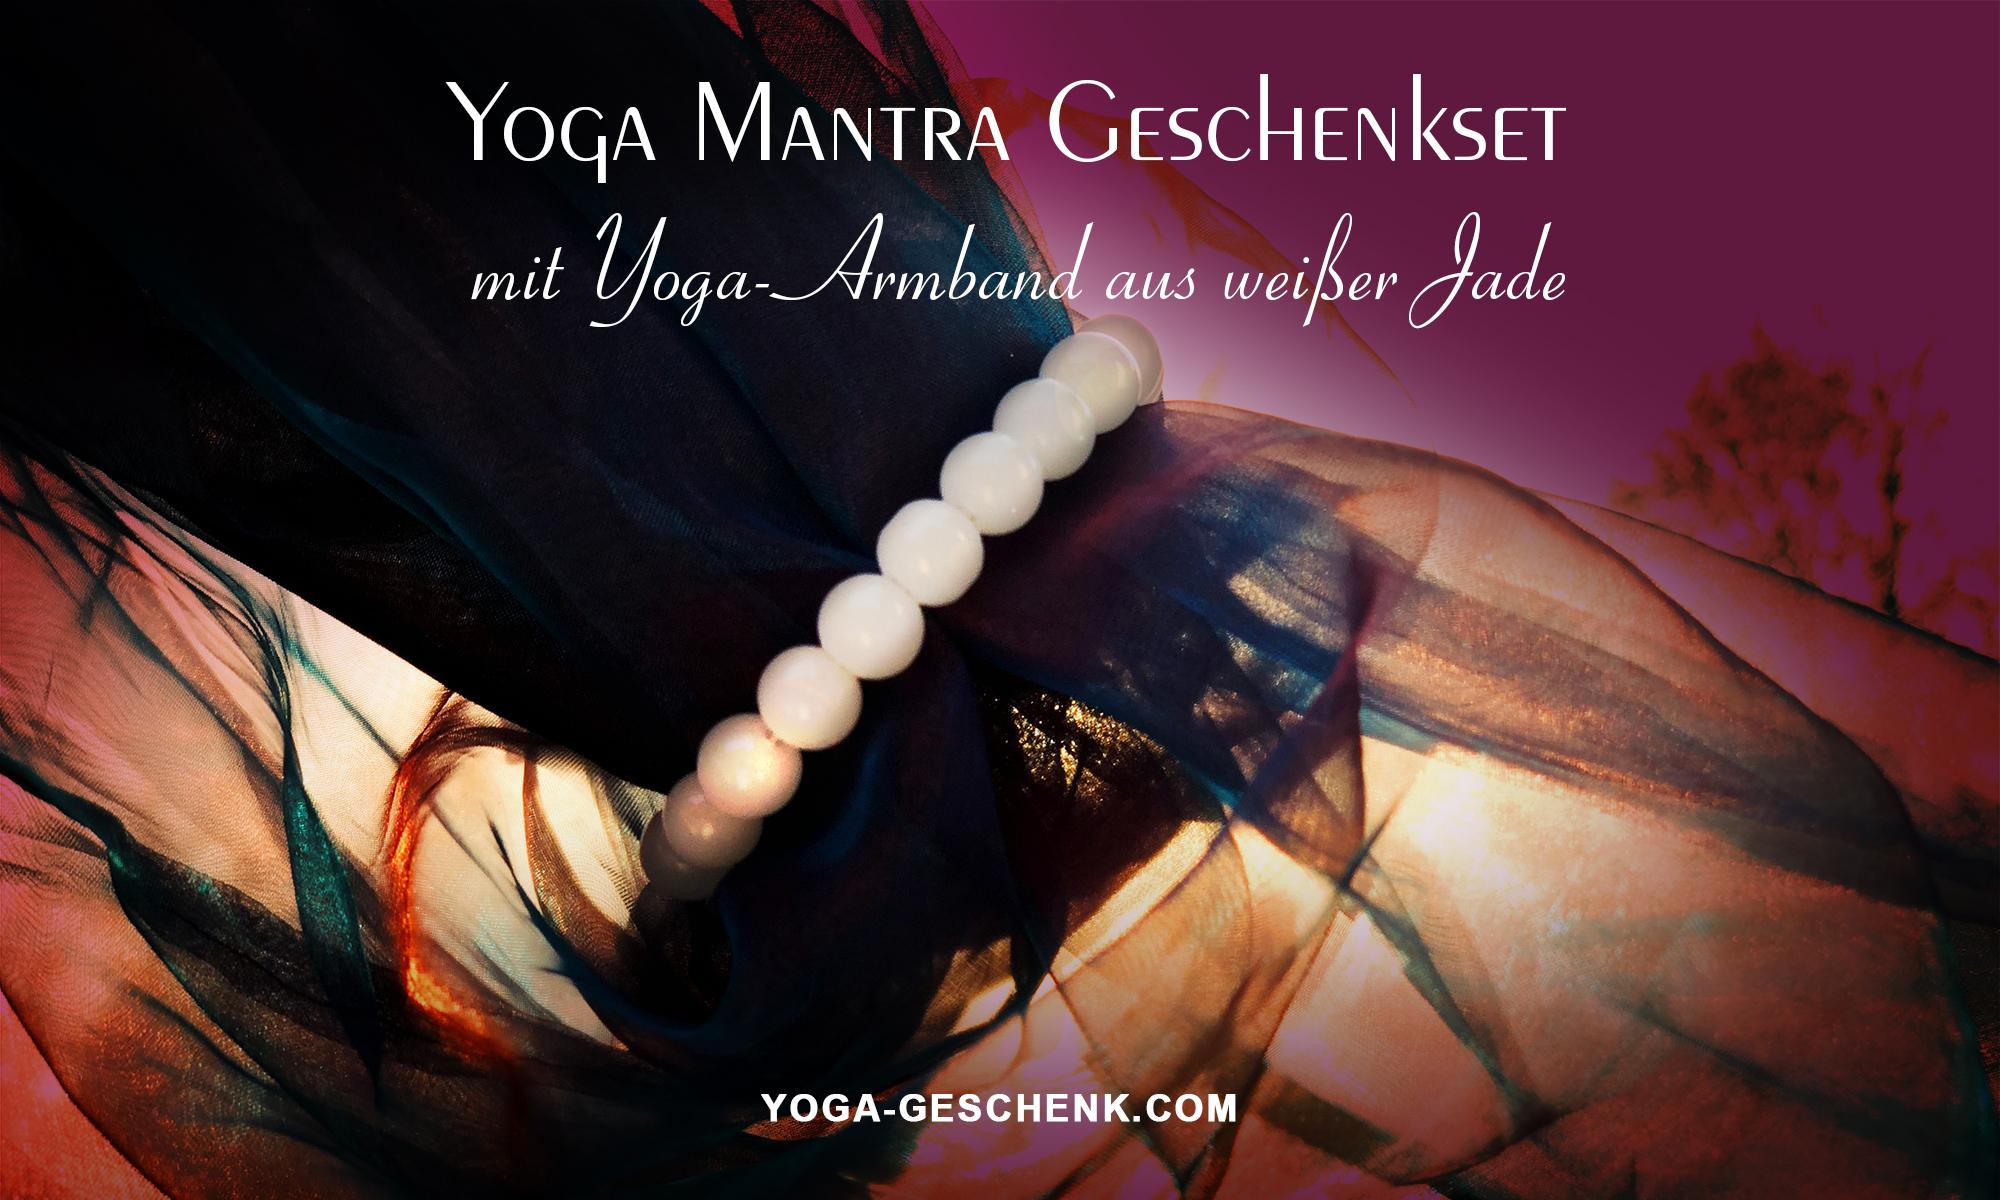 Yoga Mantra Geschenkset